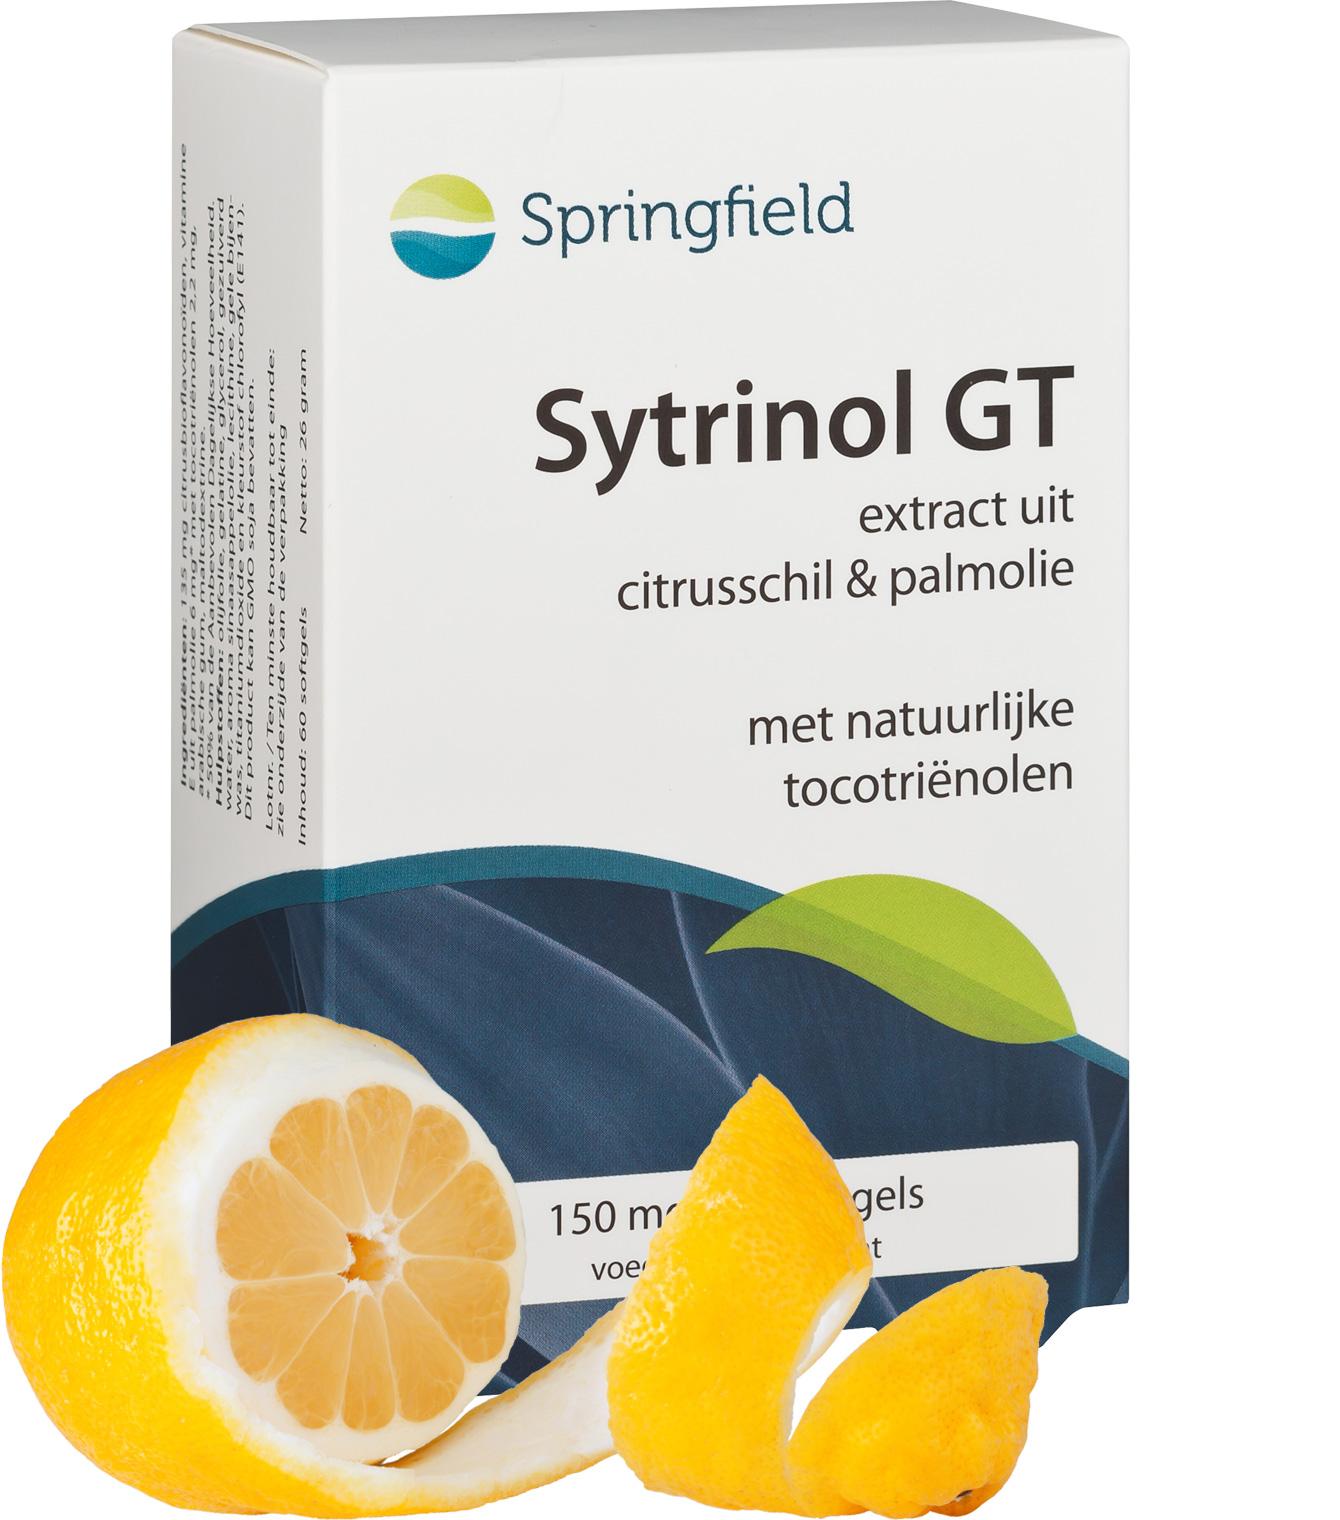 Sytrinol GT bioflavonoïden en tocotriënolen